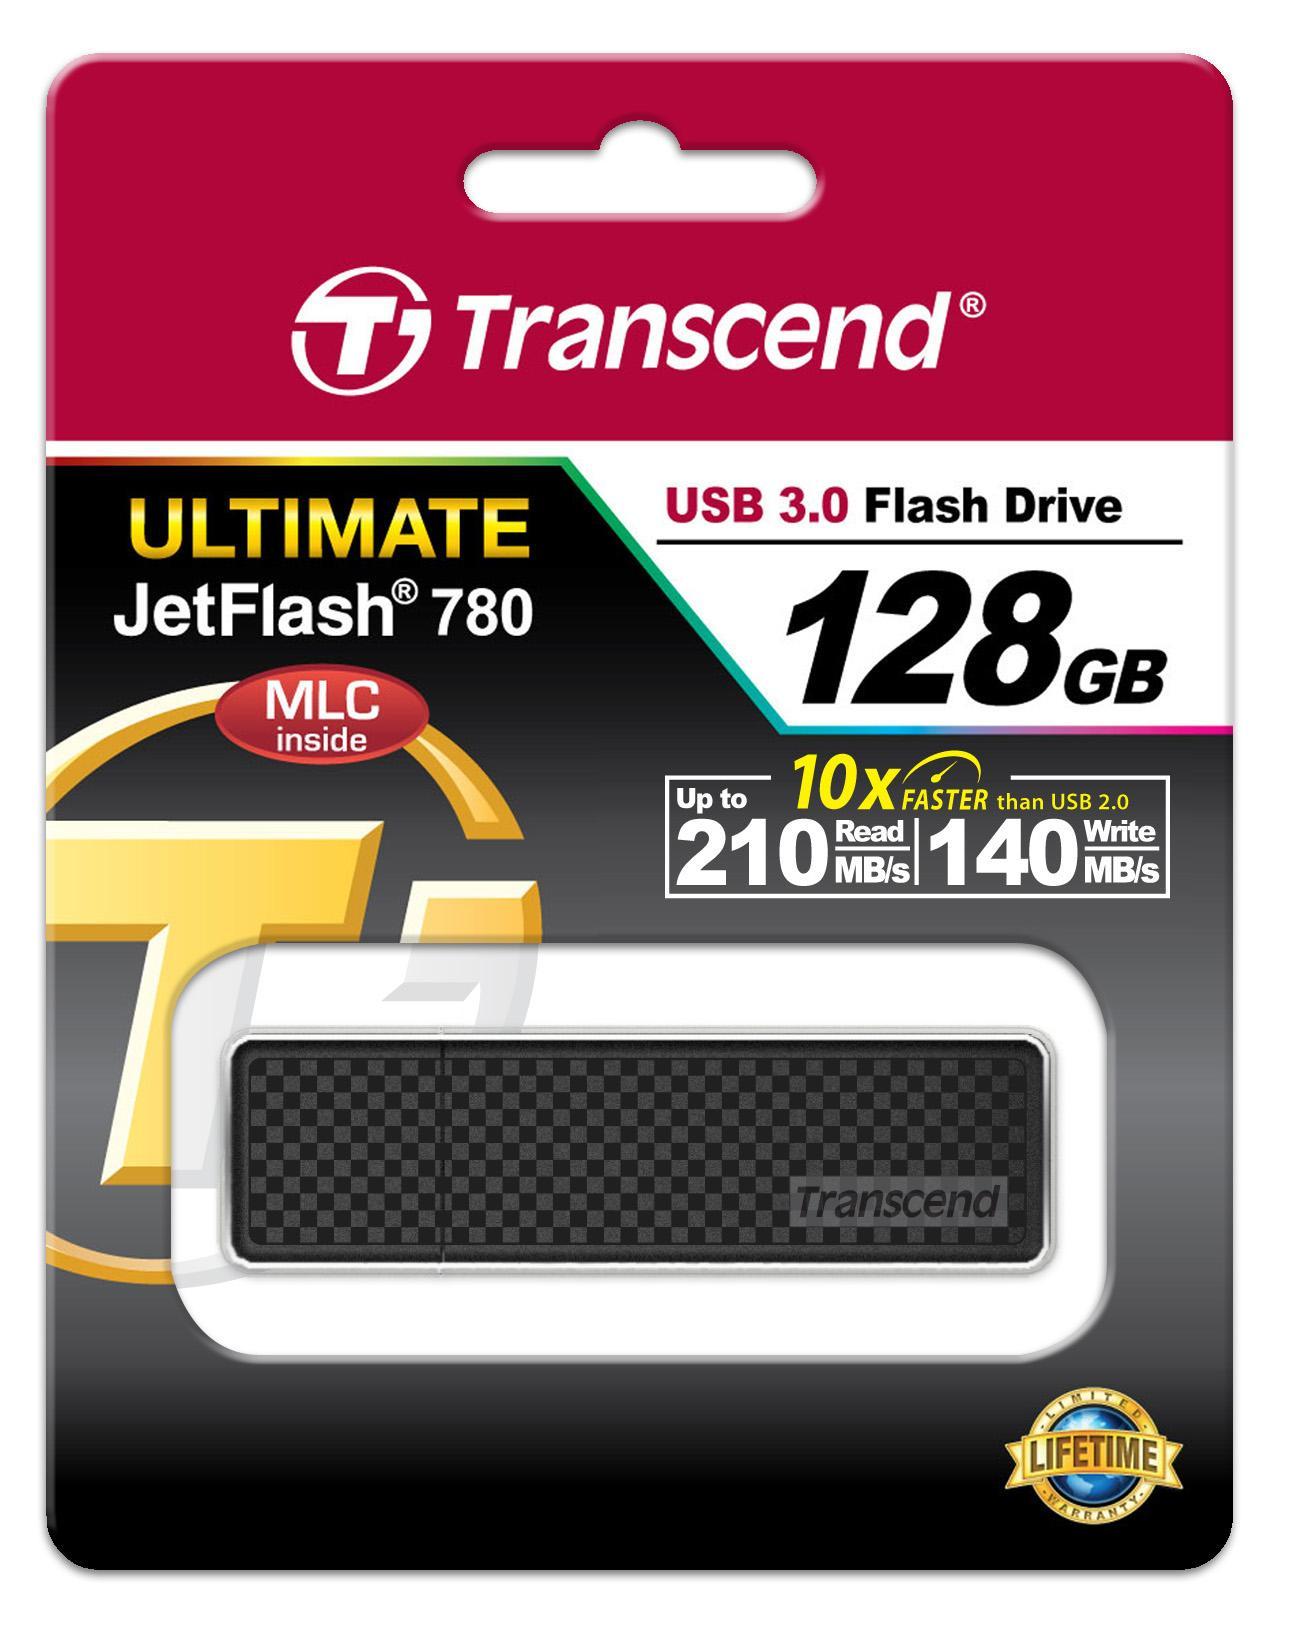 Transcend Flashdisk 128GB JetFlash 780 [128 GB/ USB 3.0/ MLC]